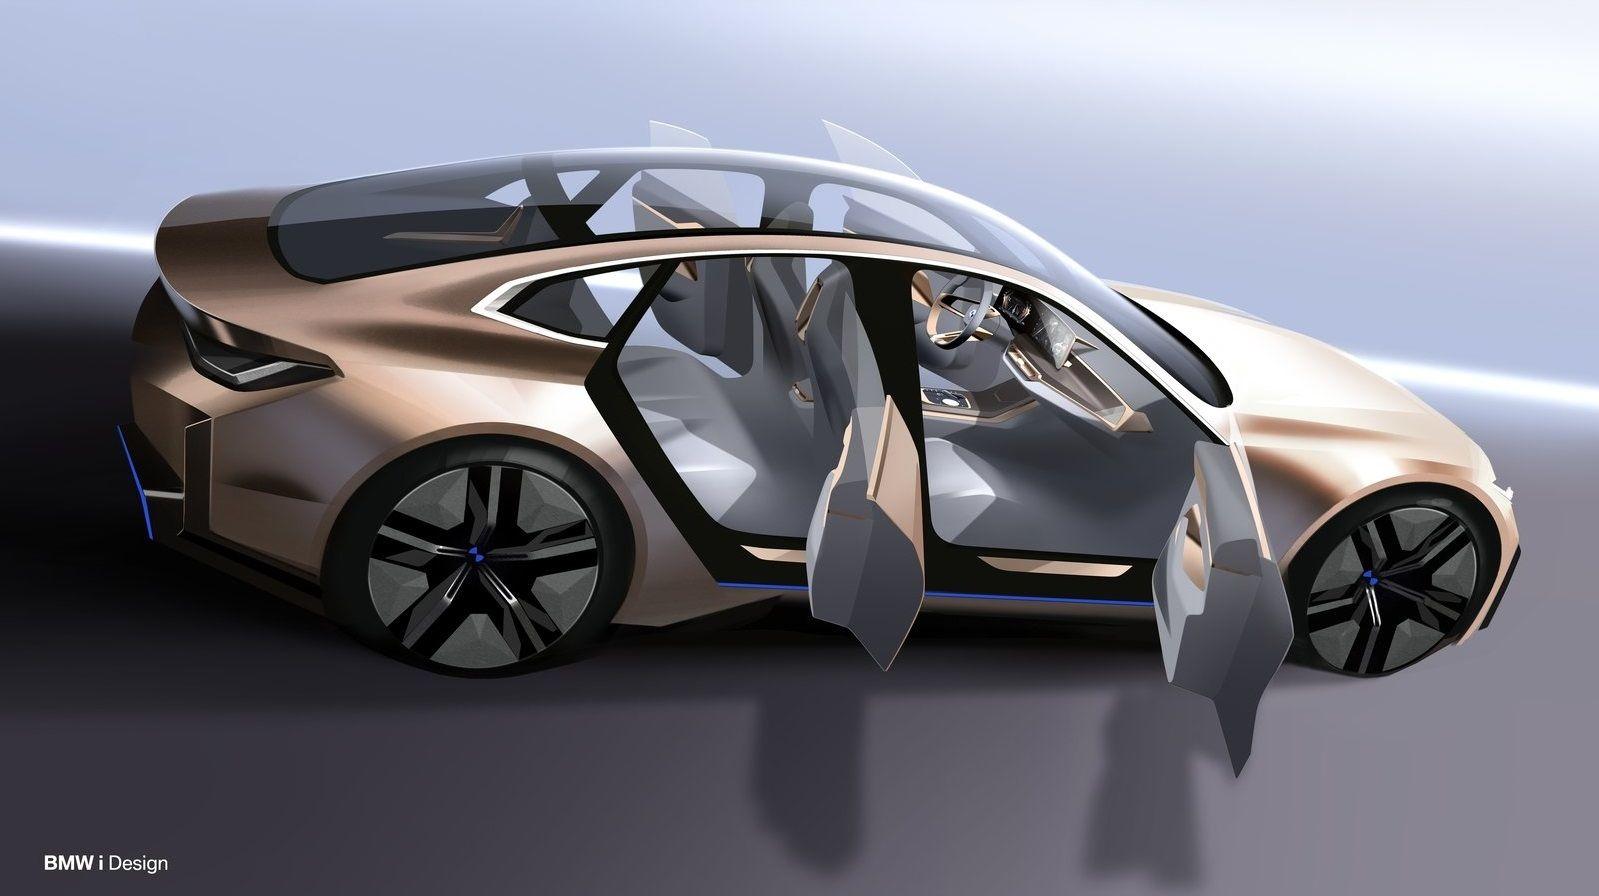 2020 Bmw I4 Concept In 2020 Bmw Concept Bmw Concept Car Bmw